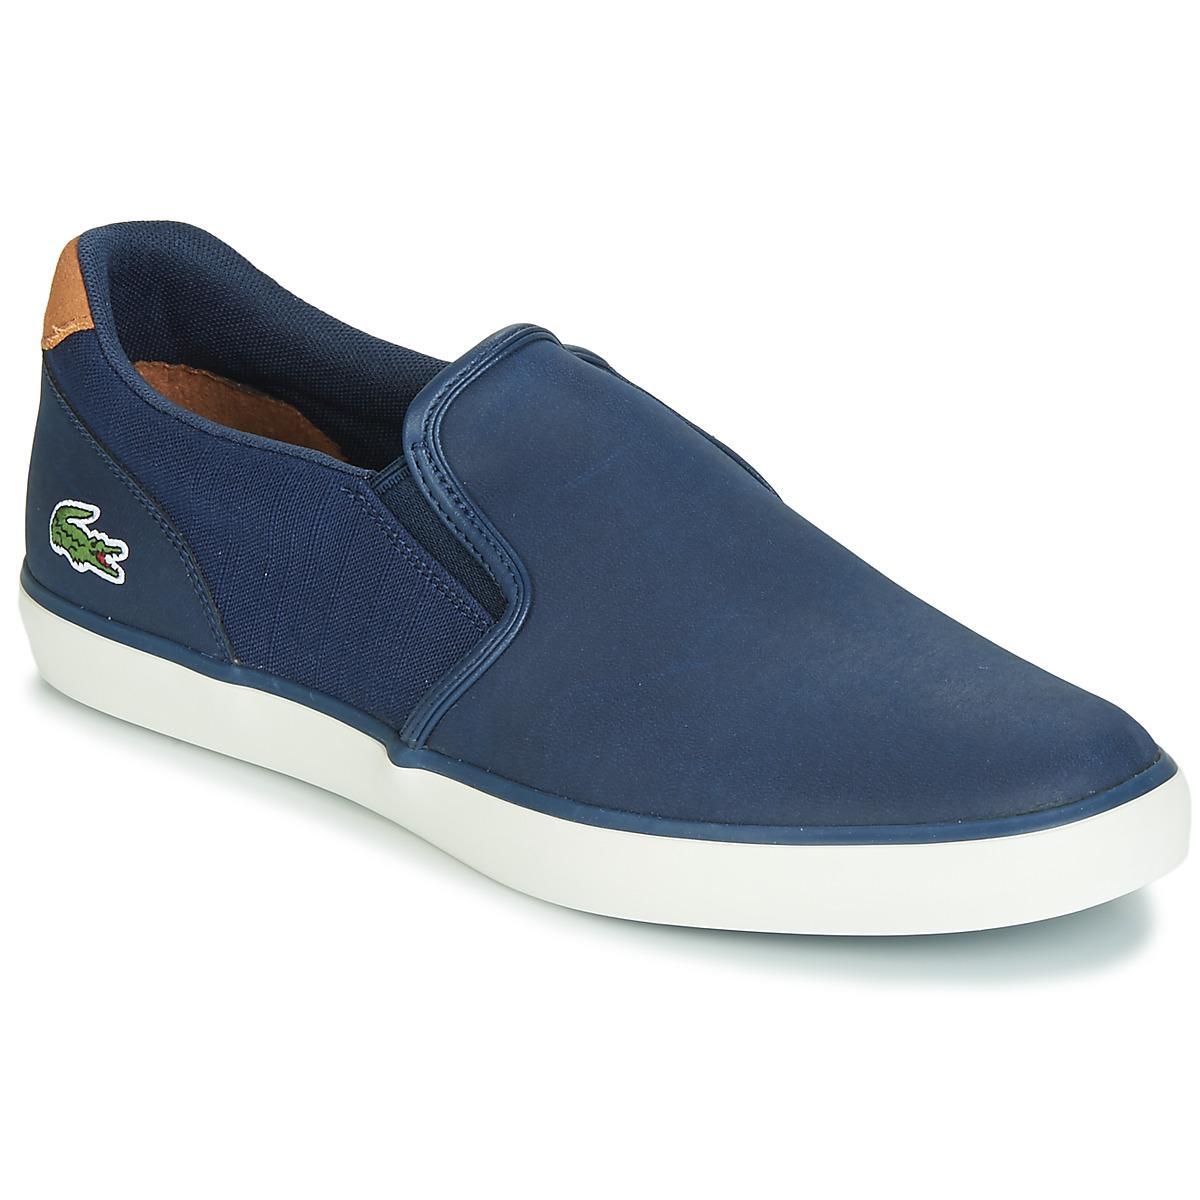 3386b6e77 Lacoste Jouer Slip 119 2 Men s Slip-ons (shoes) In Blue in Blue for ...